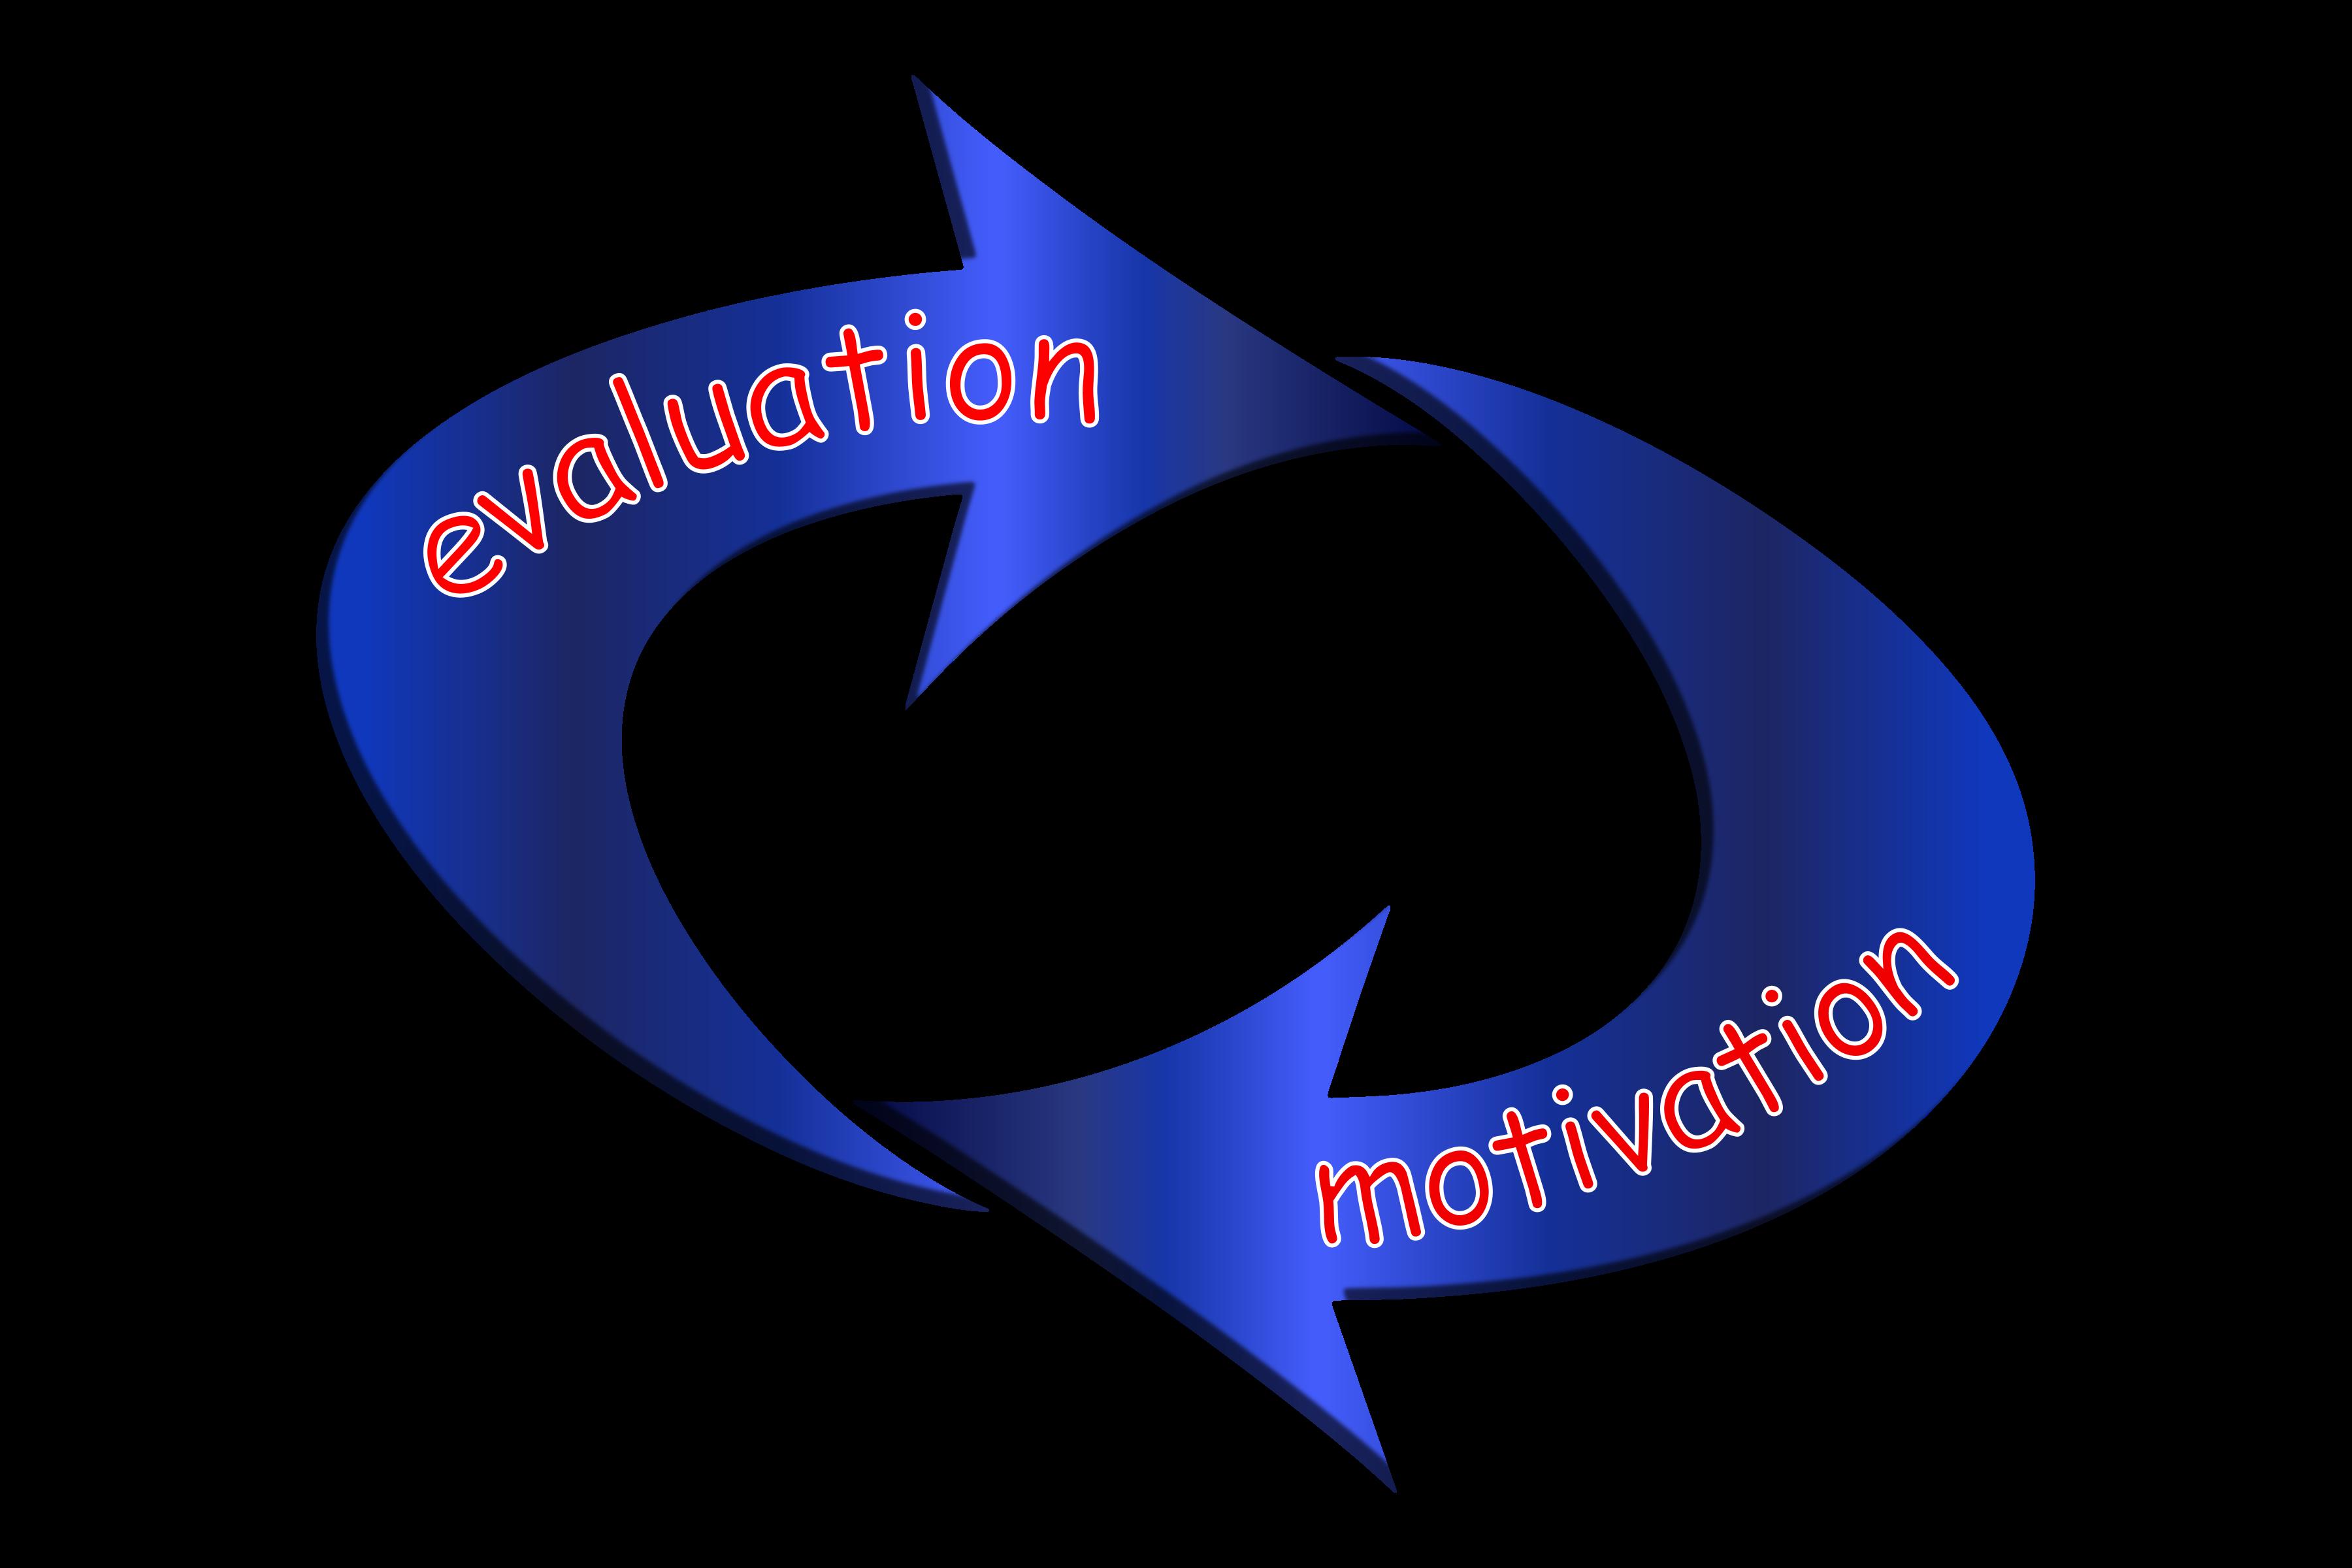 Evaluation clipart. Motivation loop big image